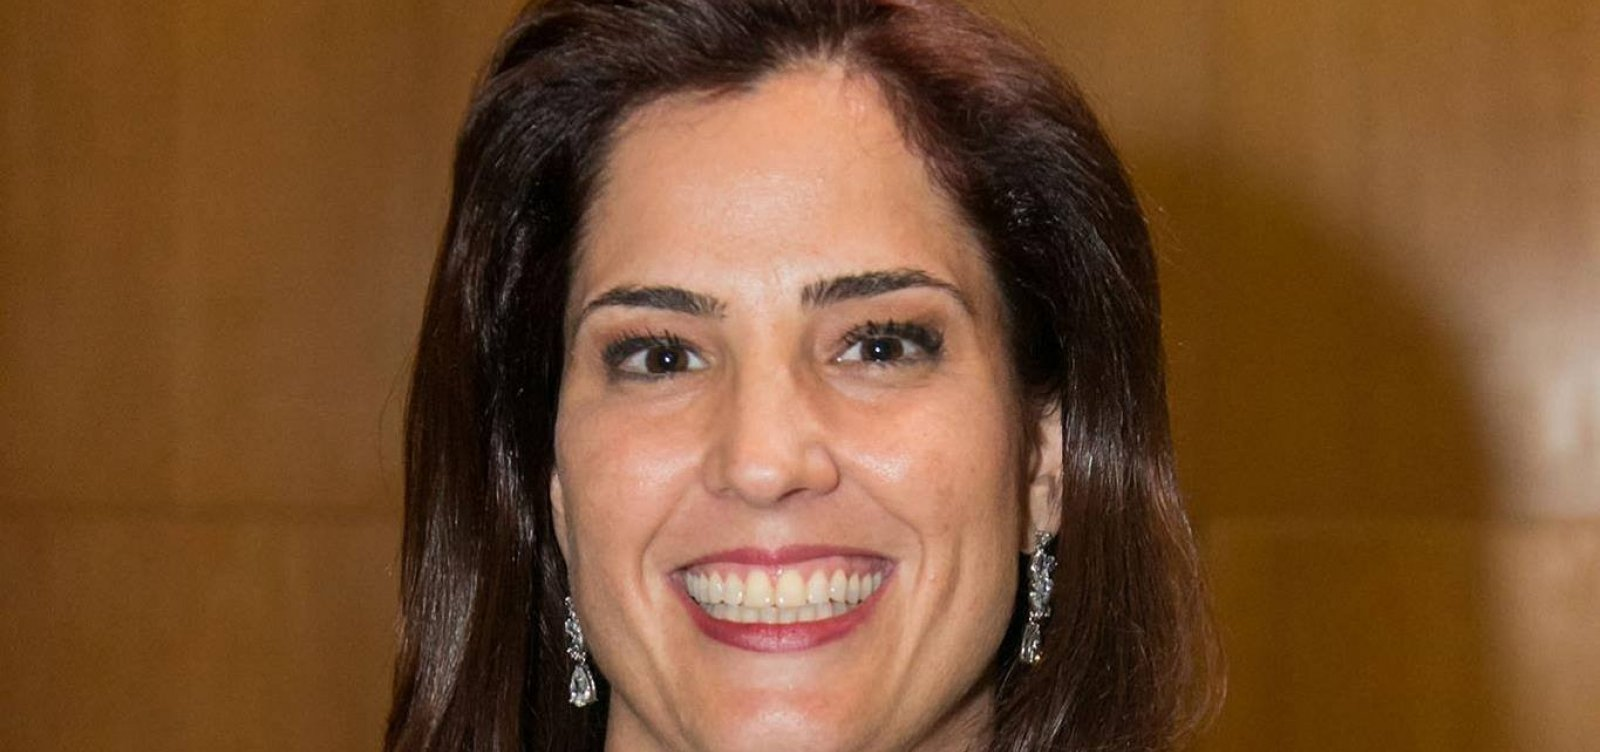 Com saída de Moro, juíza Gabriela Hardt assume Lava Jato